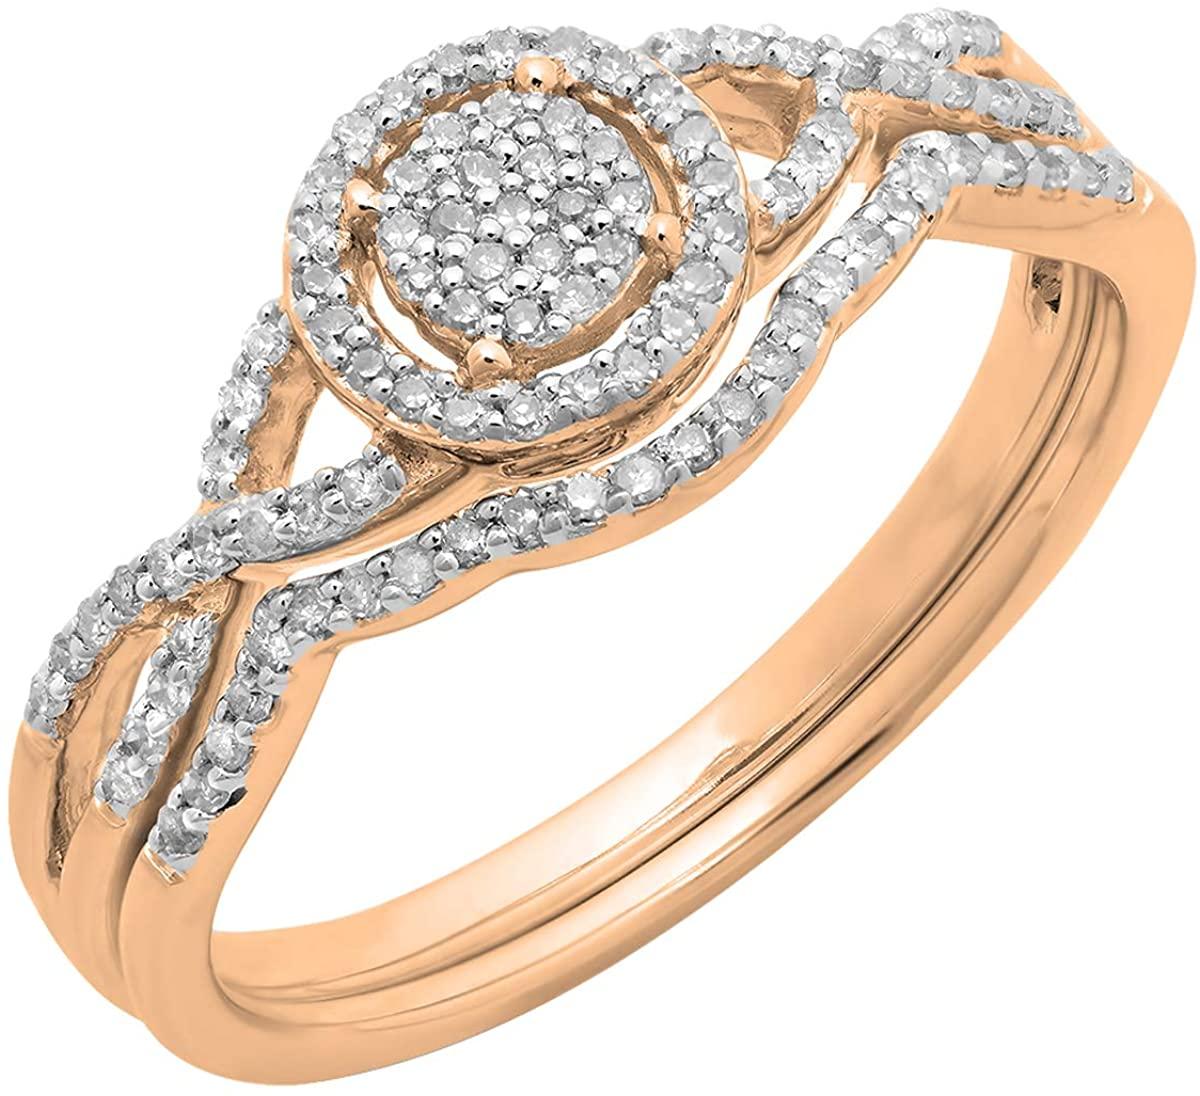 Dazzlingrock Collection 0.25 Carat (ctw) 10K Gold Round Lab Grown Diamond Ladies Twisted Engagement Ring Set 1/4 CT